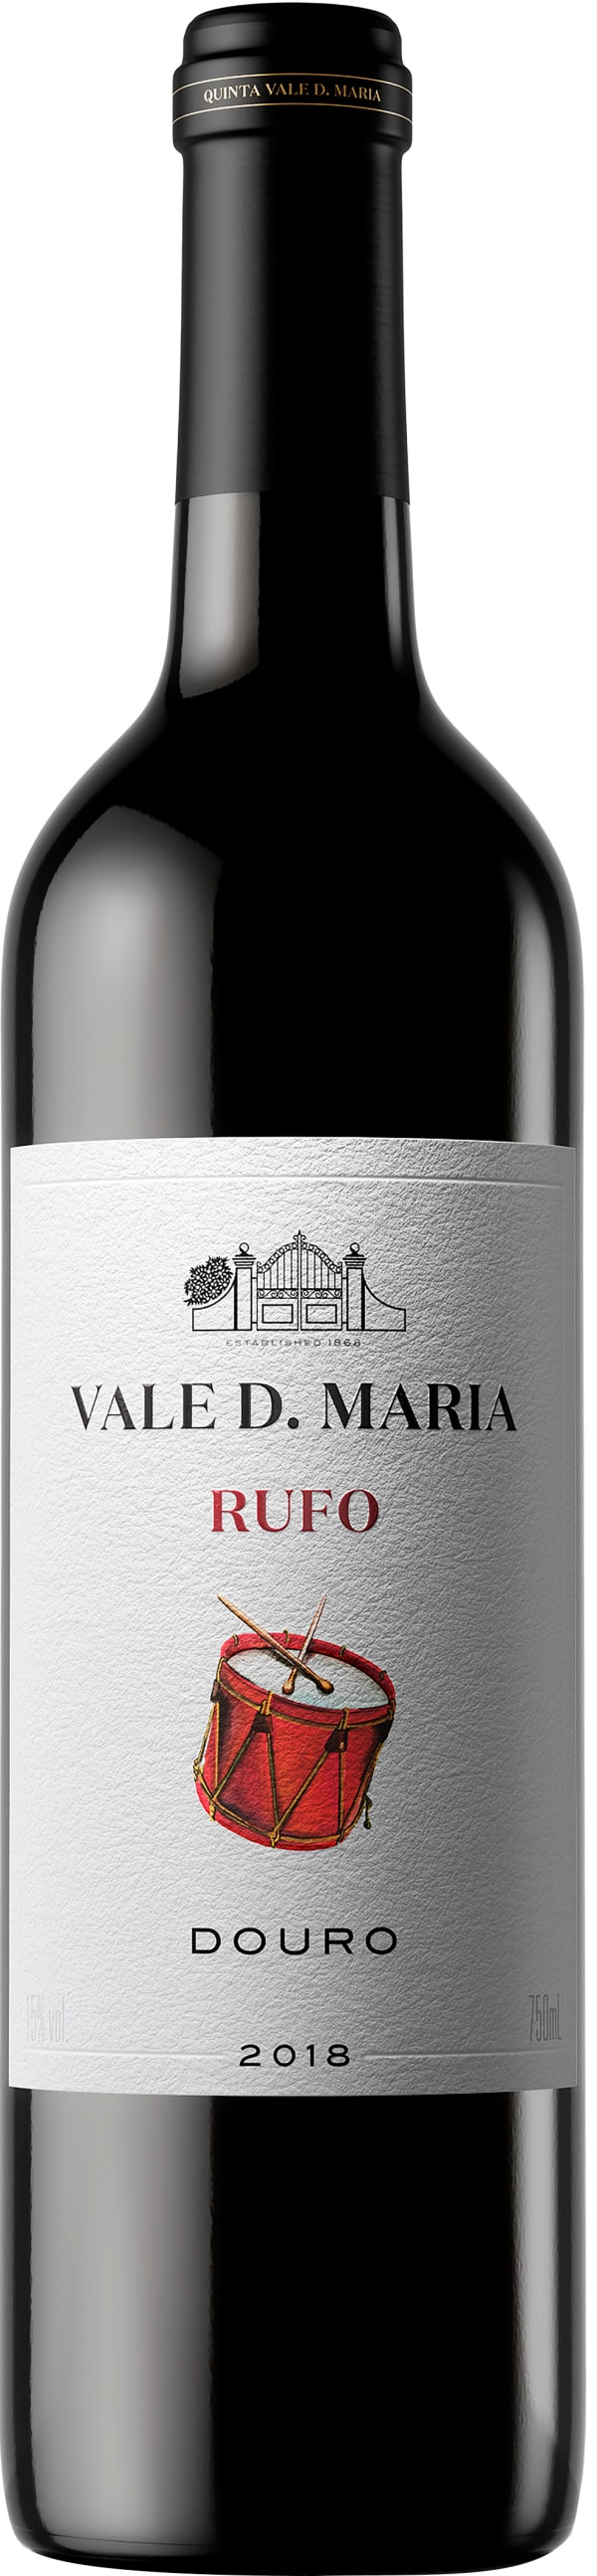 Vale D. Maria Rufo 2015